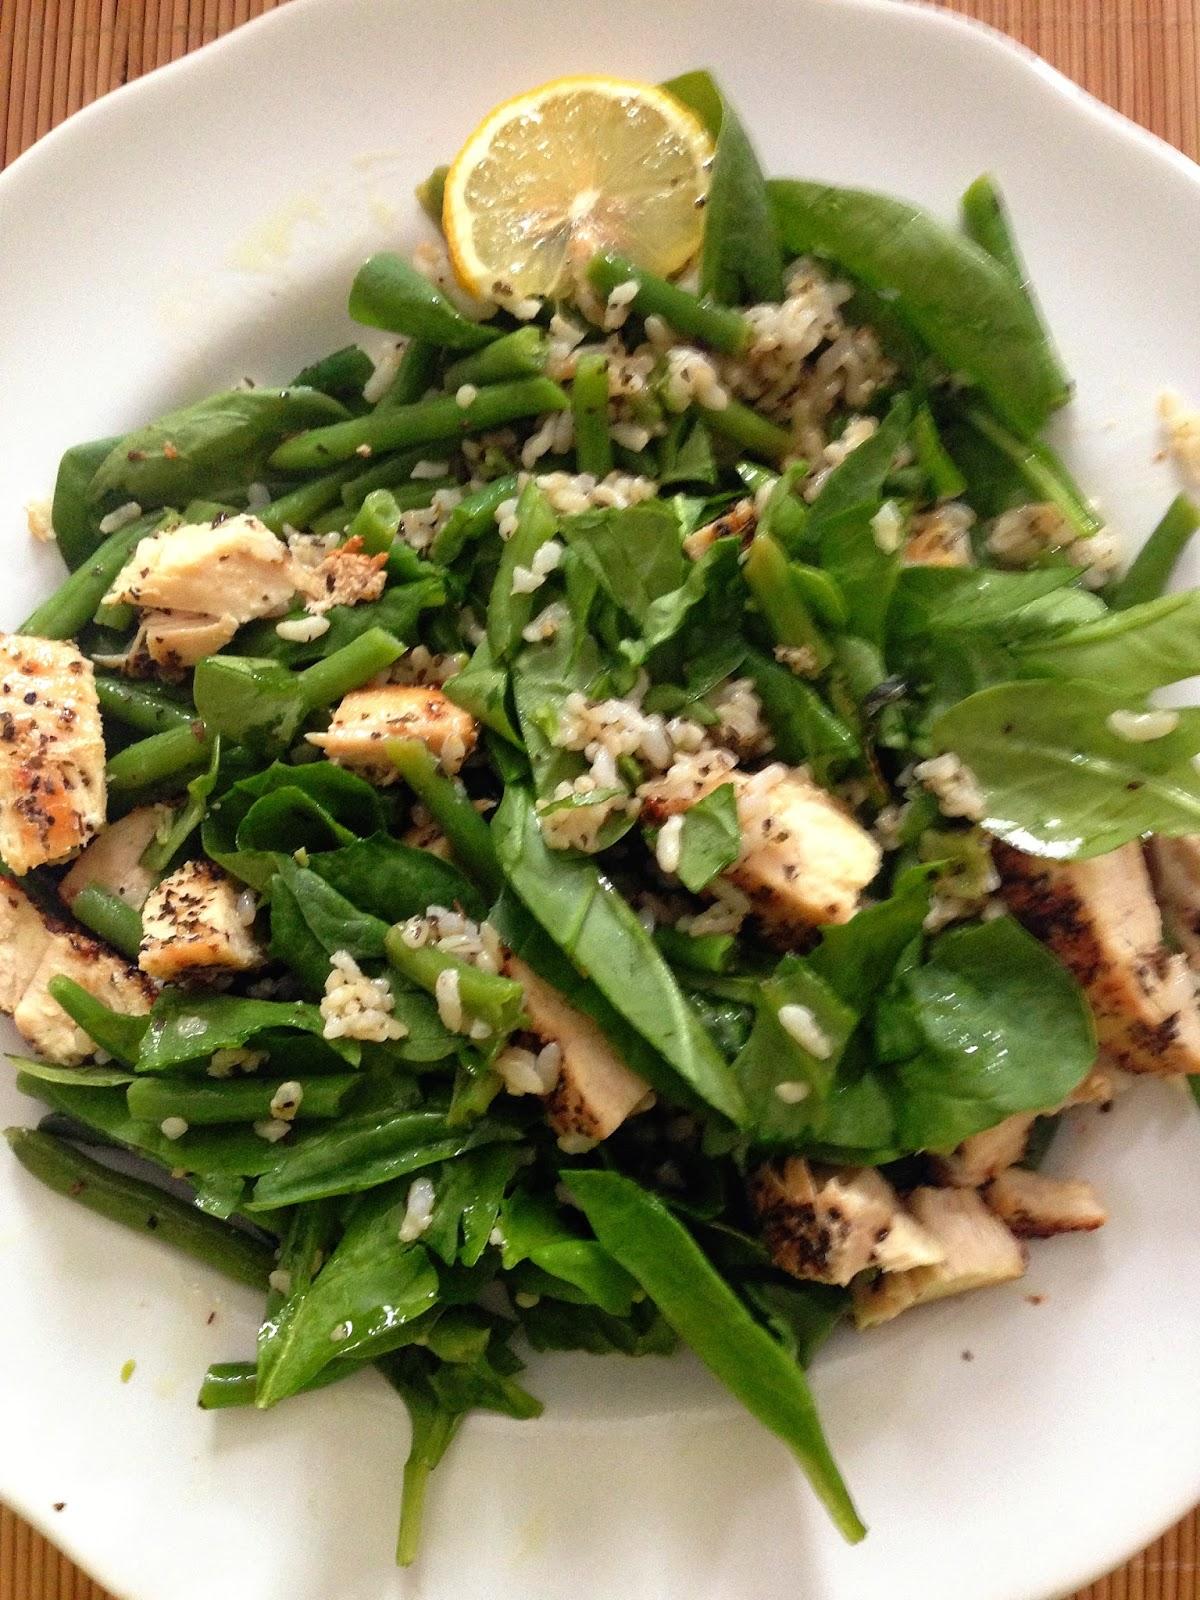 Taylor Made Lemon Basil Spinach Salad With Warm Brown